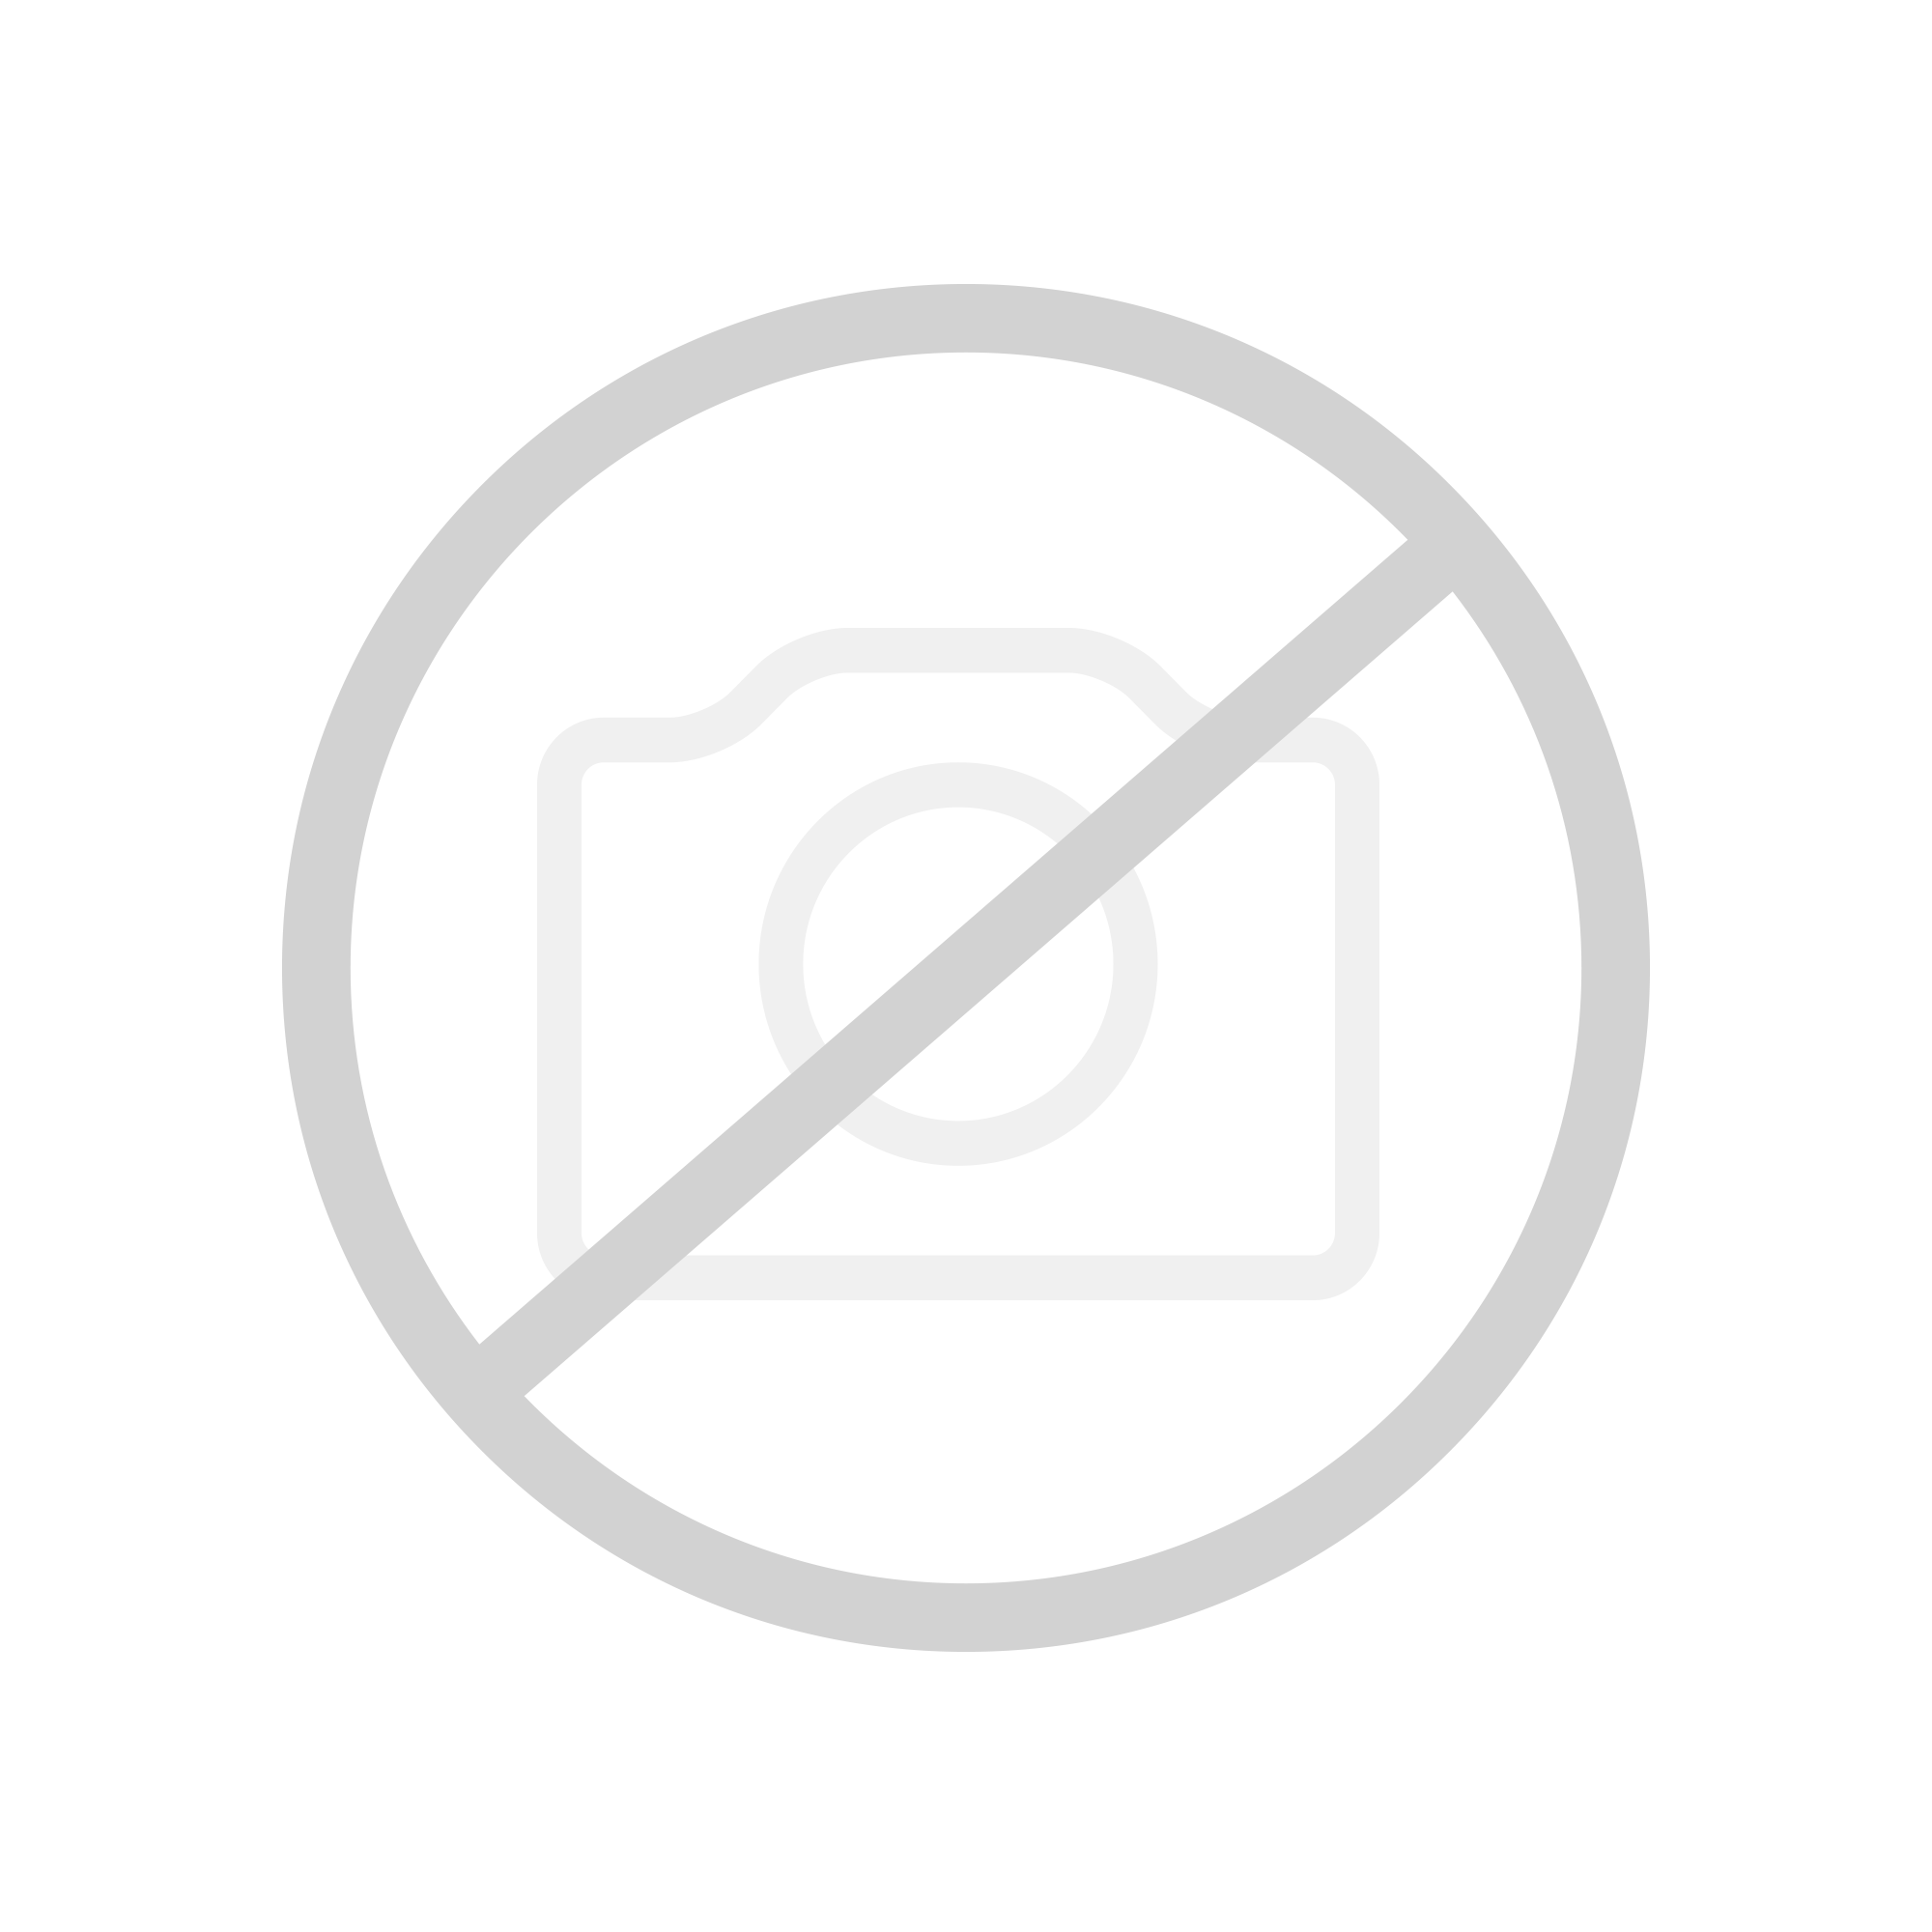 tellkamp easy freistehende oval badewanne 0100 076 a cr reuter. Black Bedroom Furniture Sets. Home Design Ideas